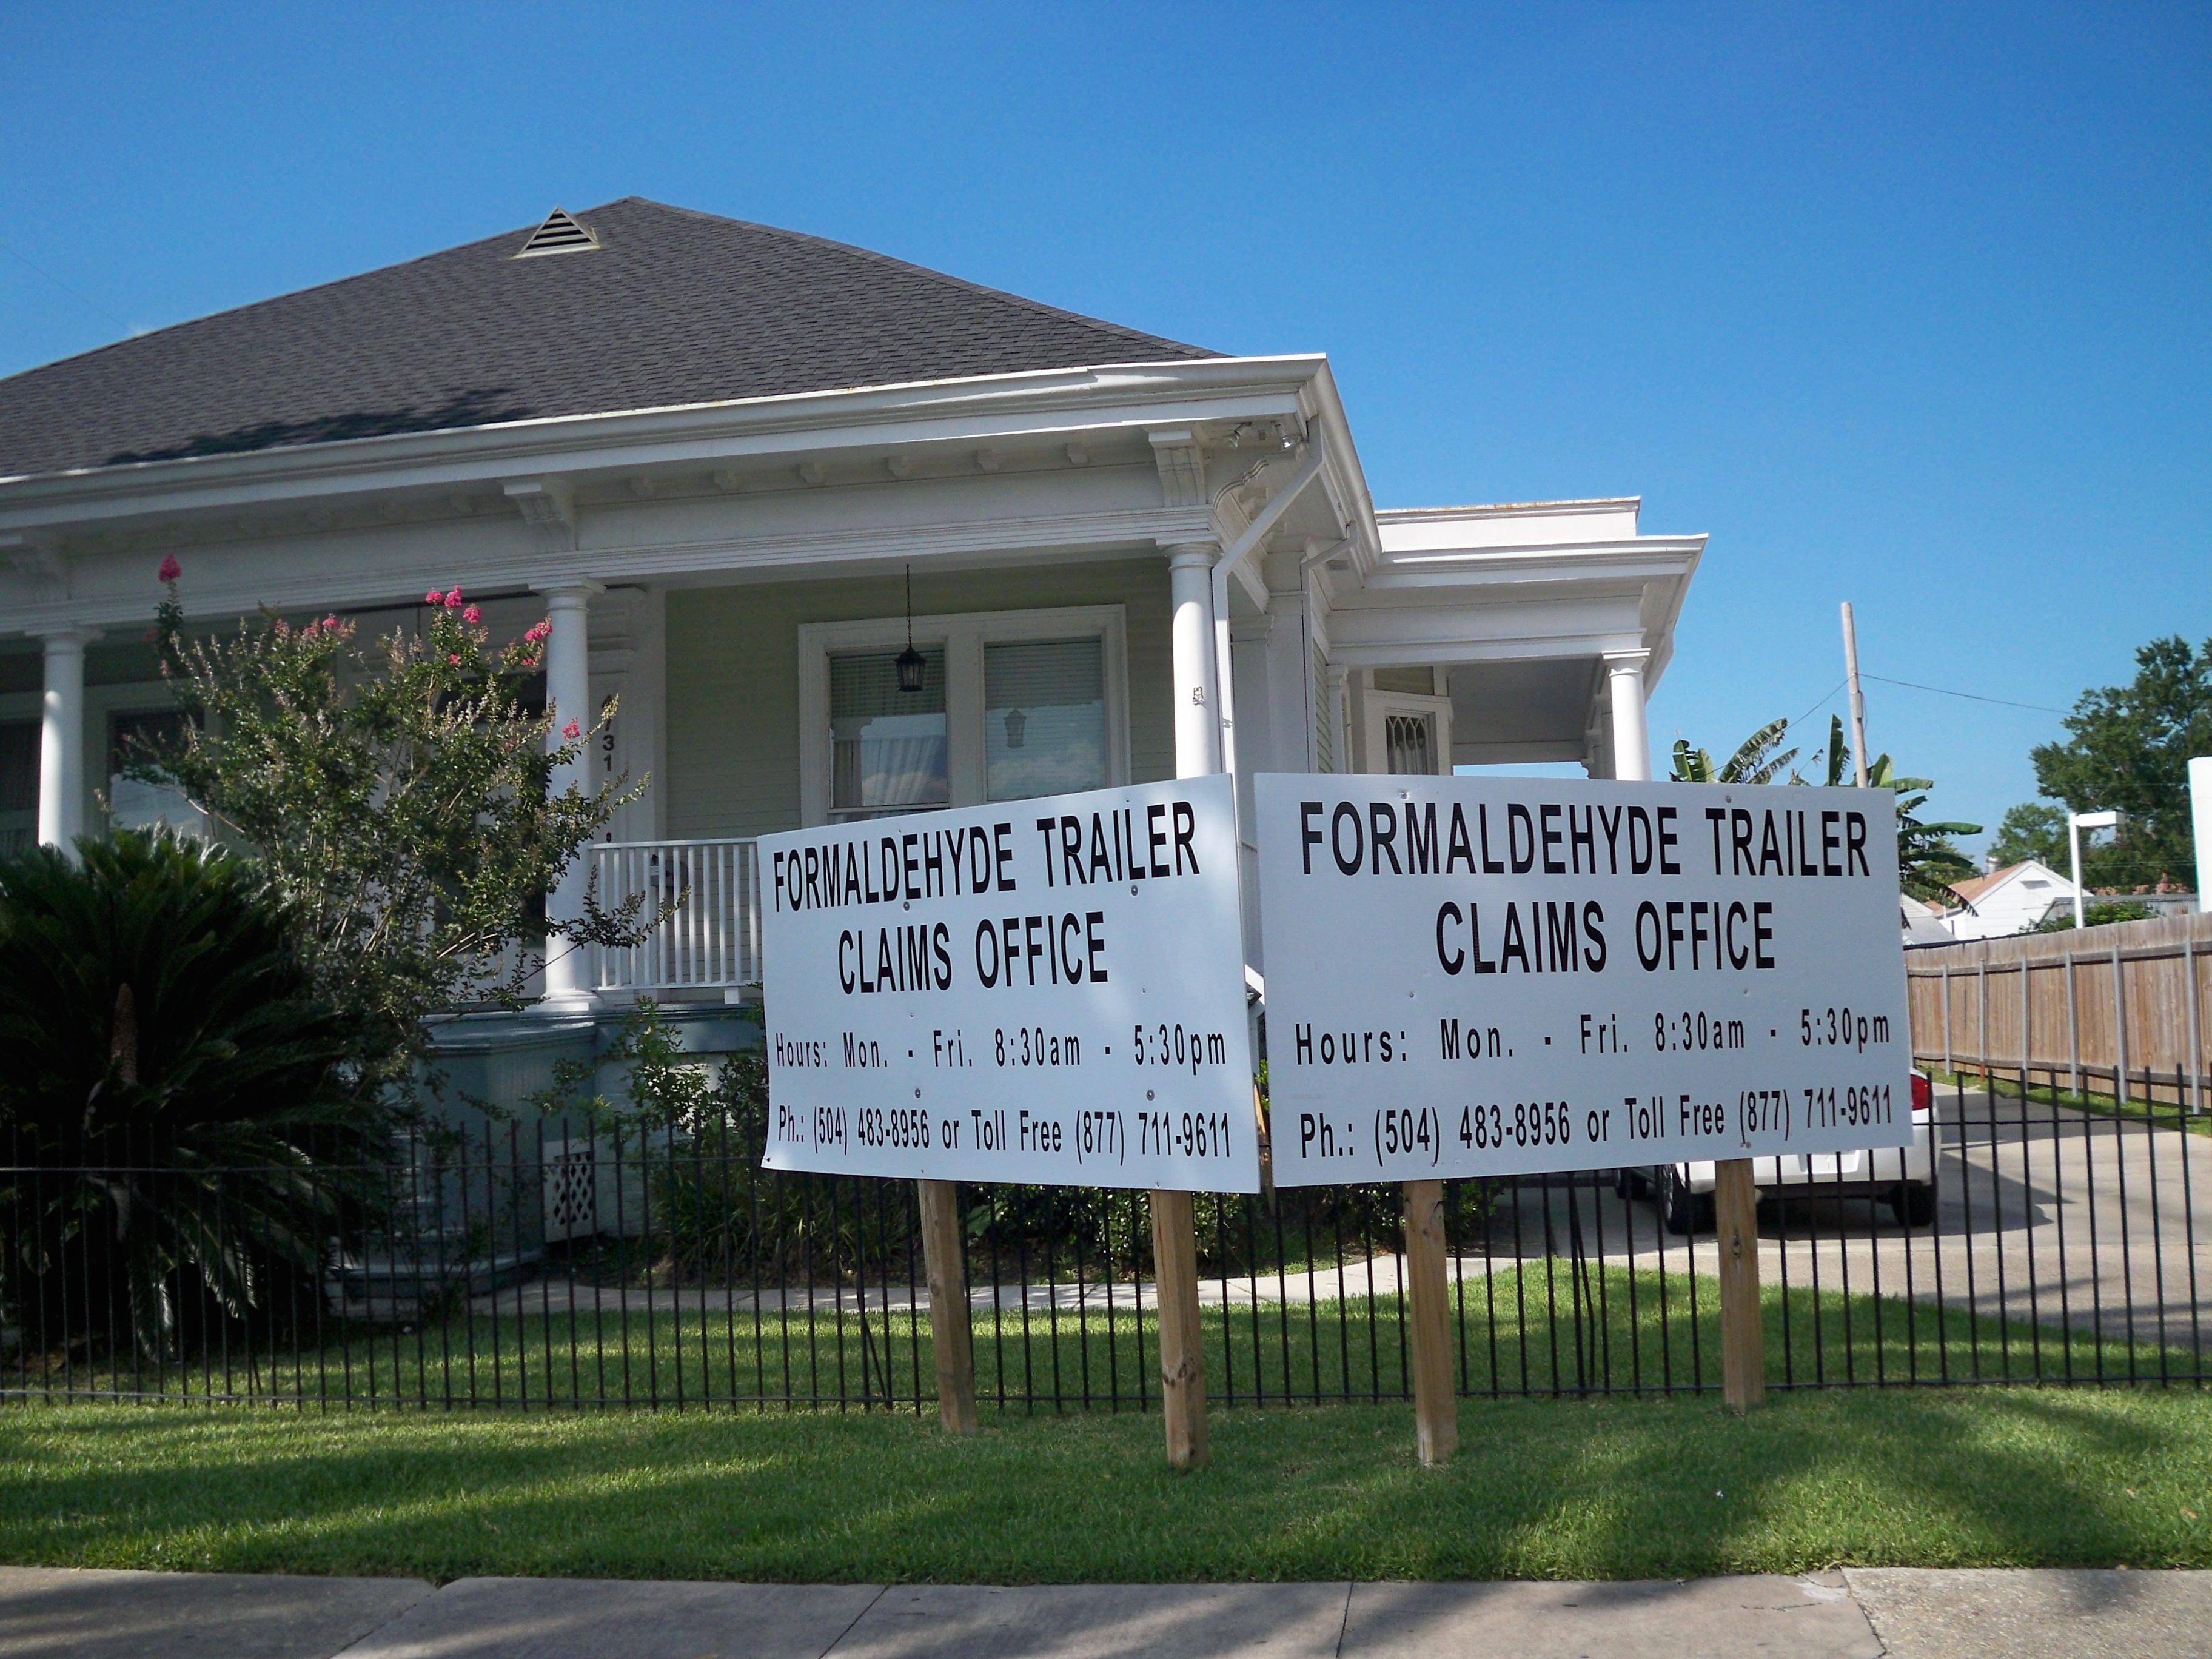 FEMA Formaldehyde Trailer Claims Office